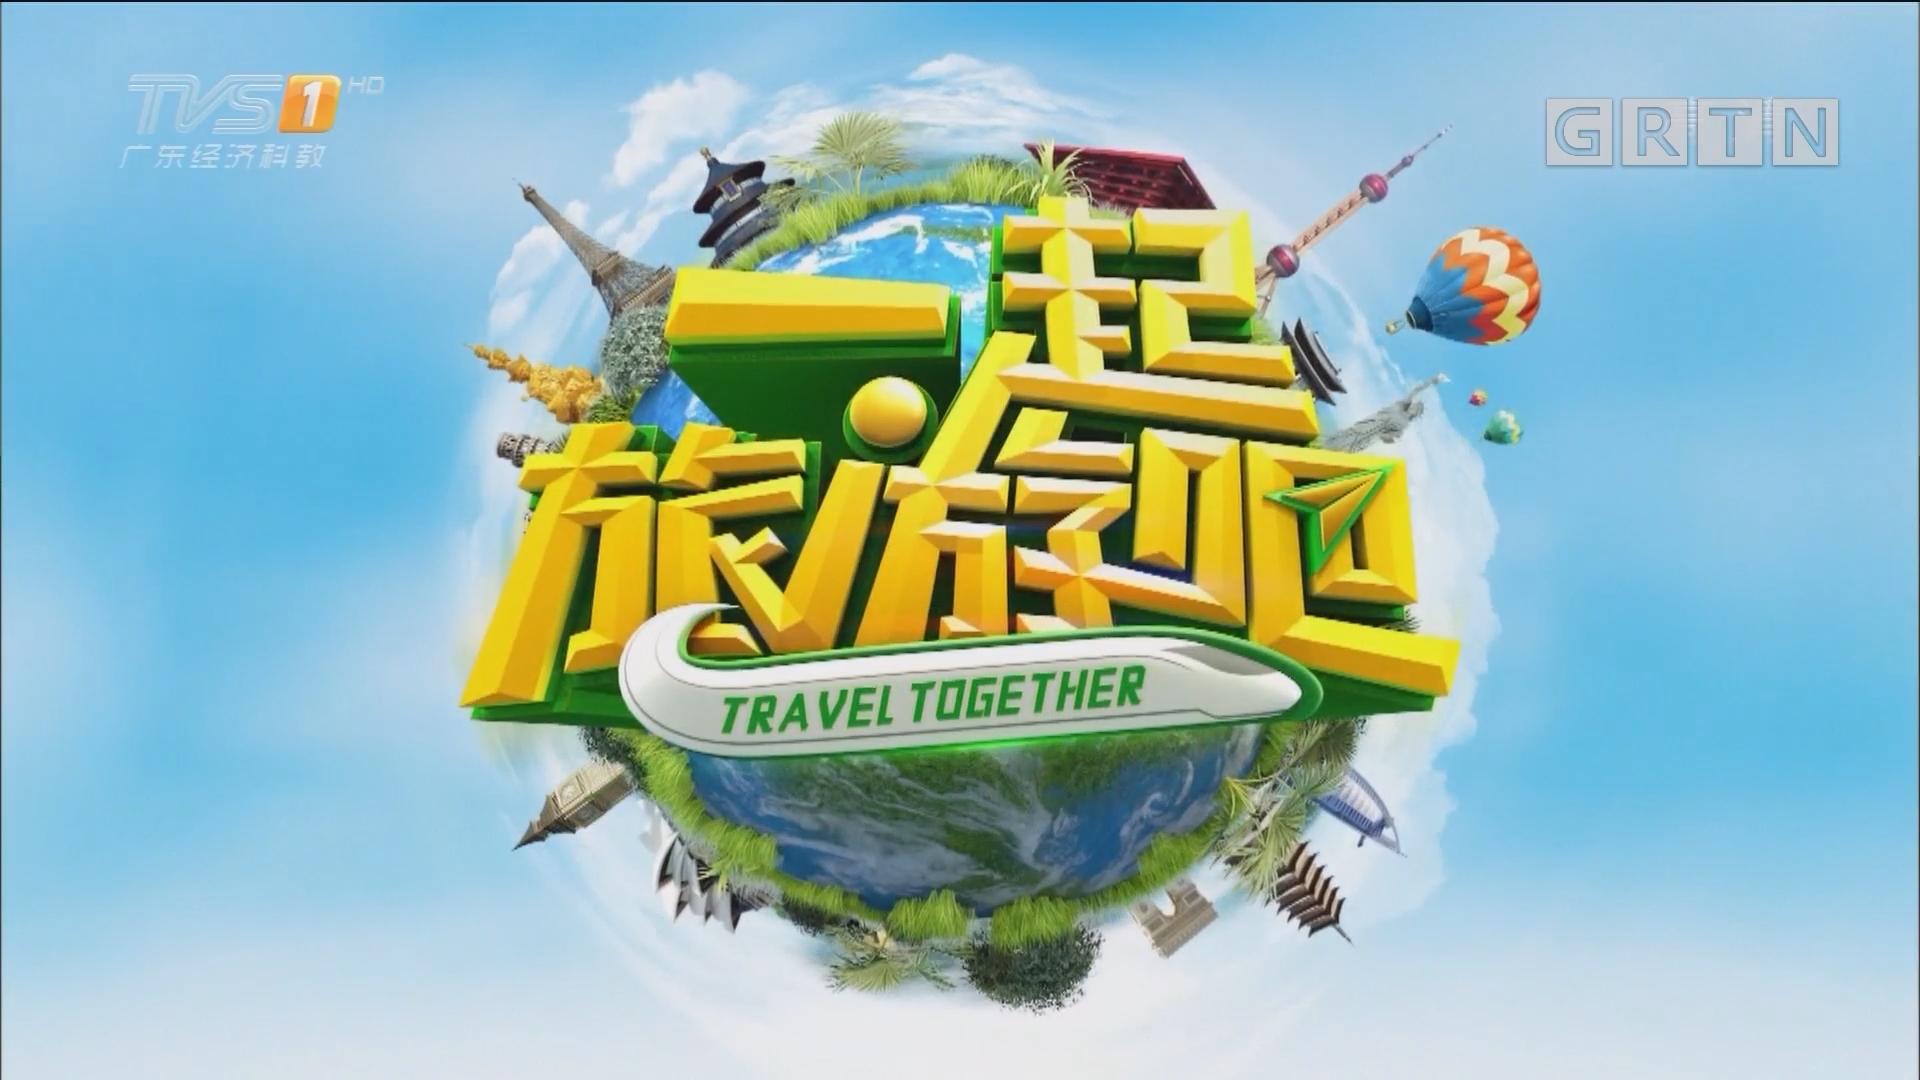 [HD][2017-06-17]一起旅游吧:贵州 镇远古镇